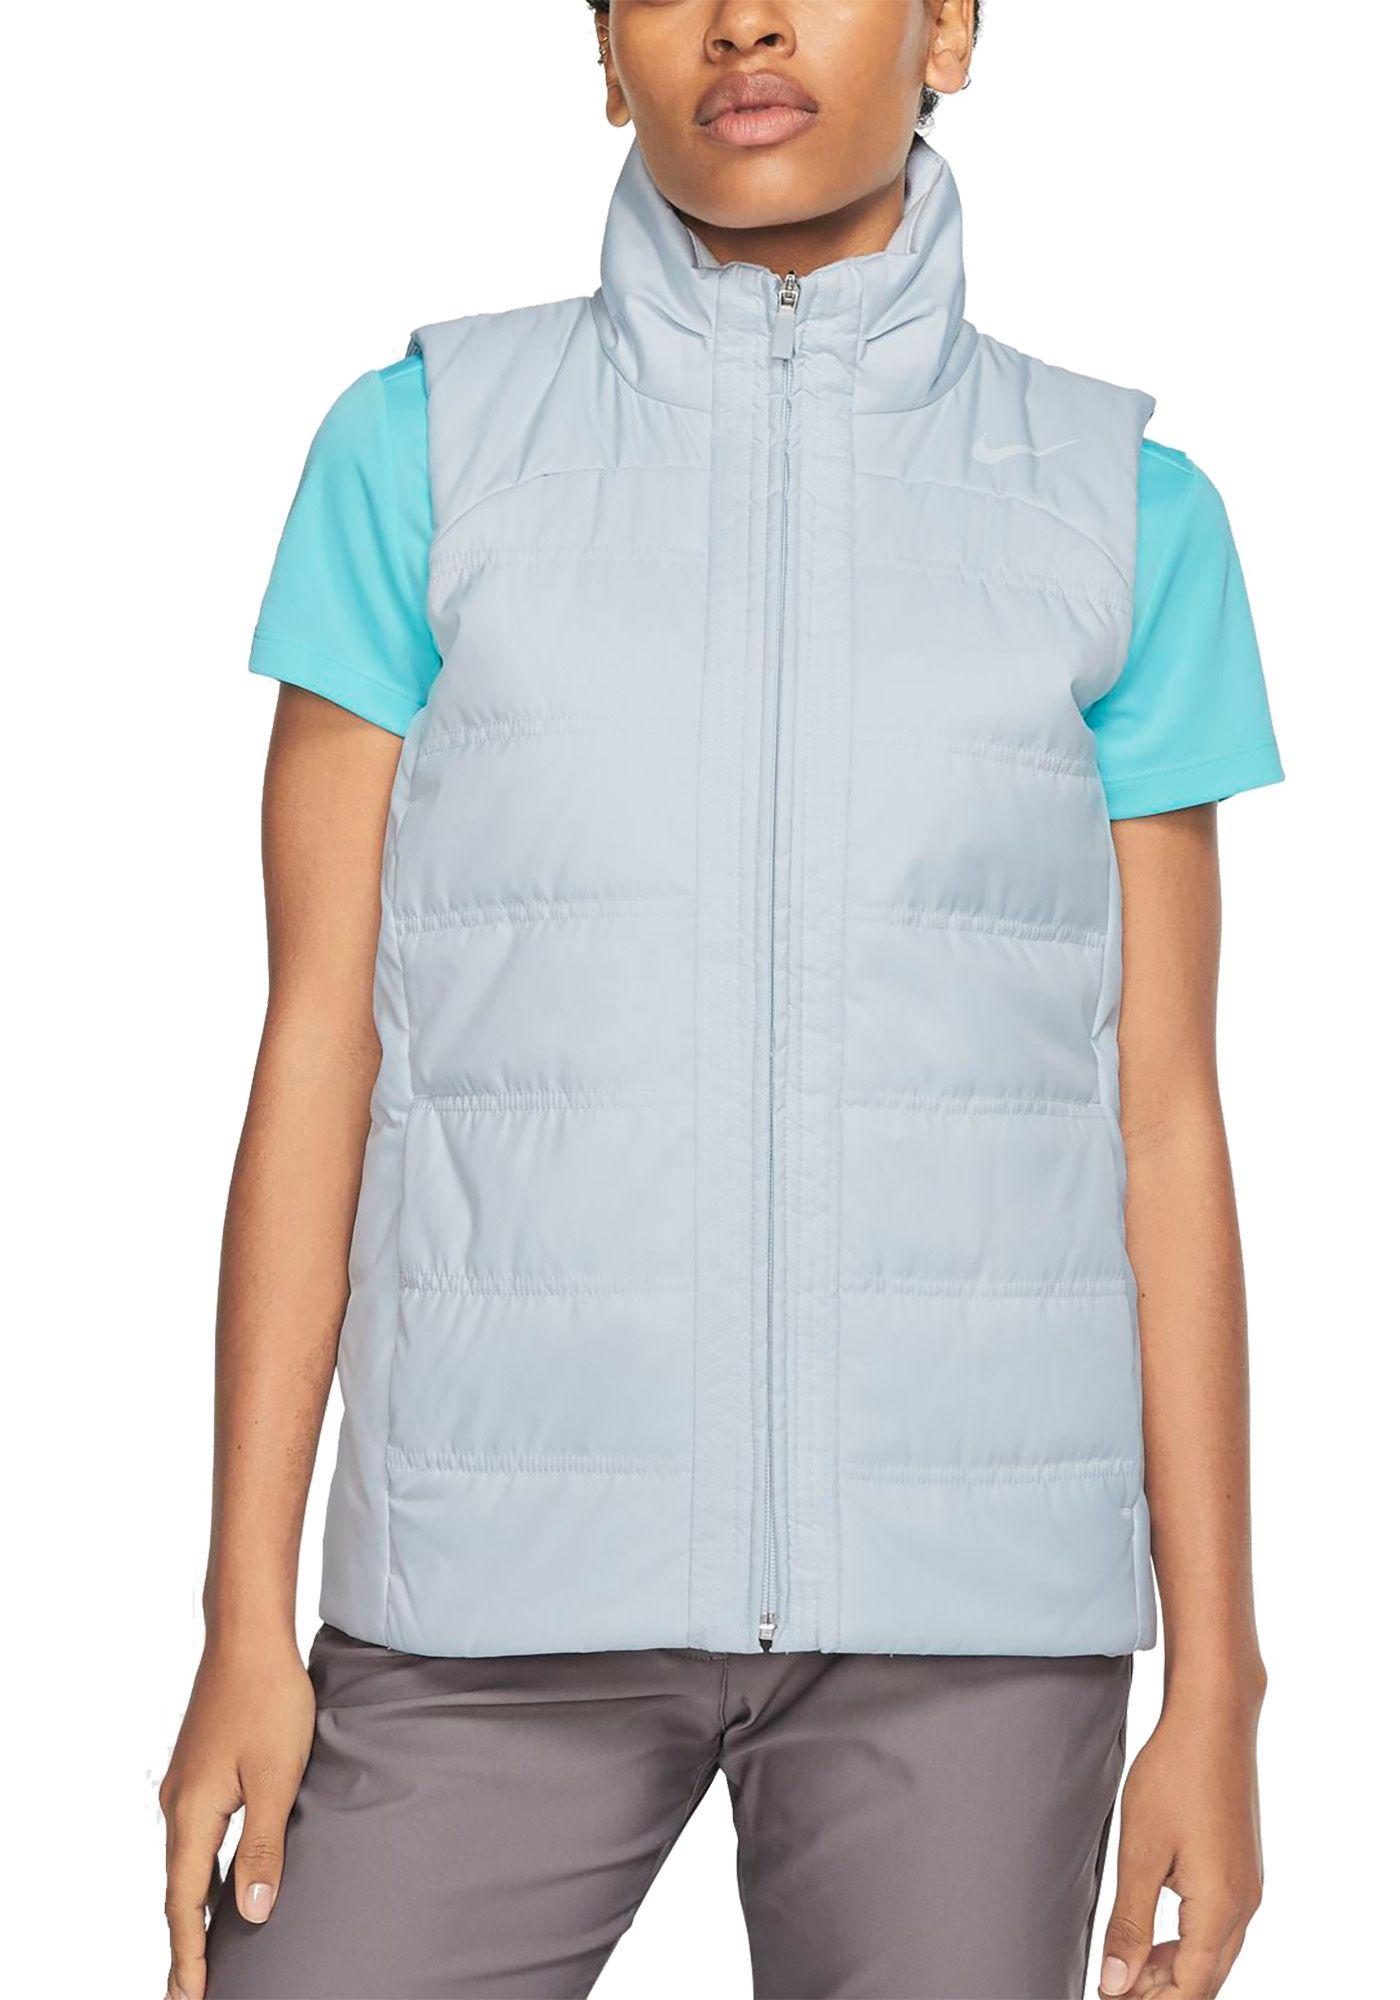 Nike Women's Repel Golf Vest